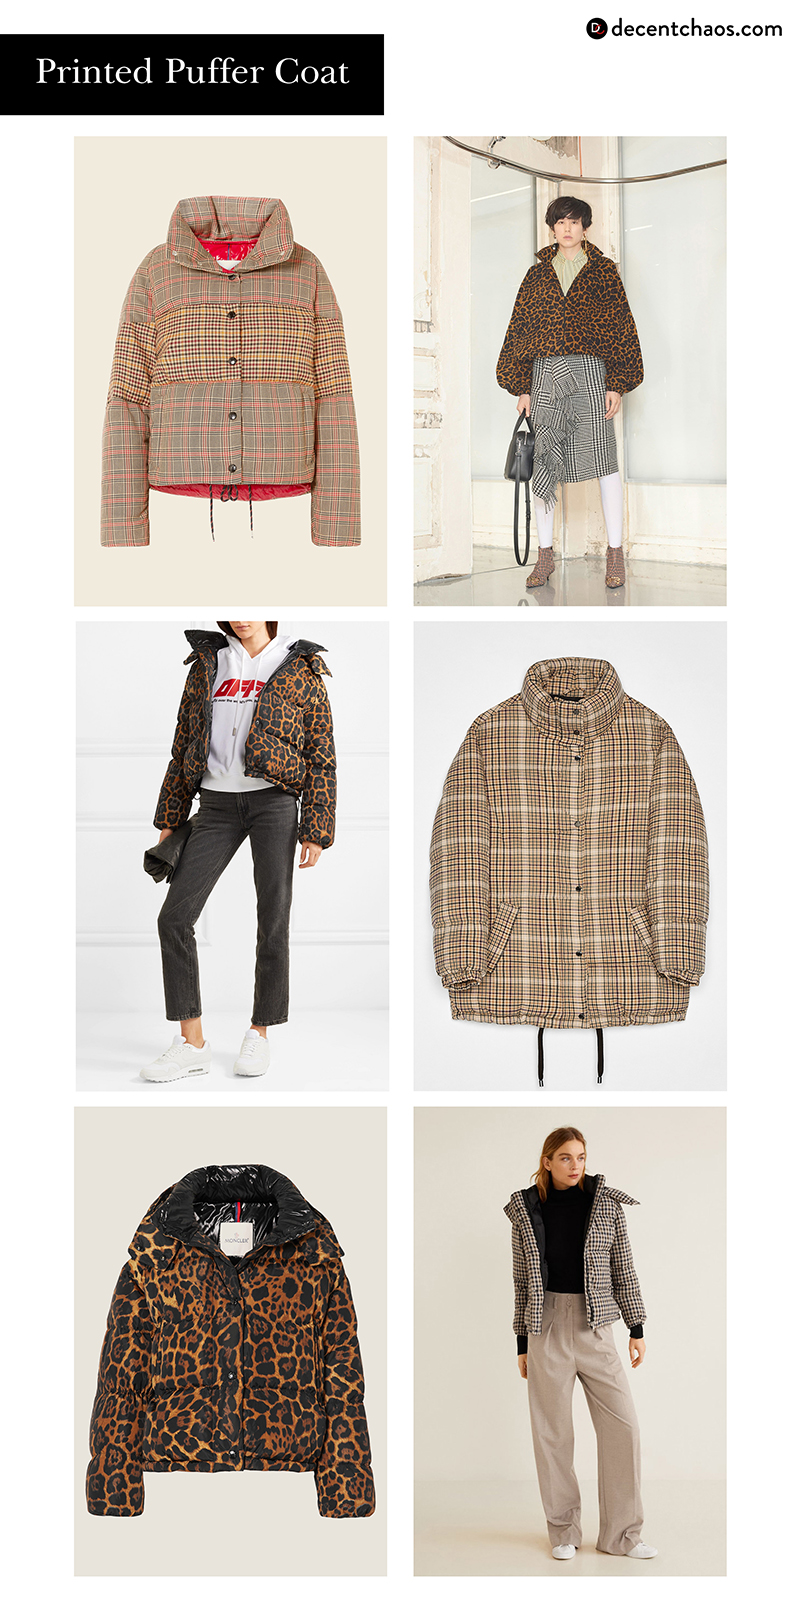 puffer-coat-print.jpg